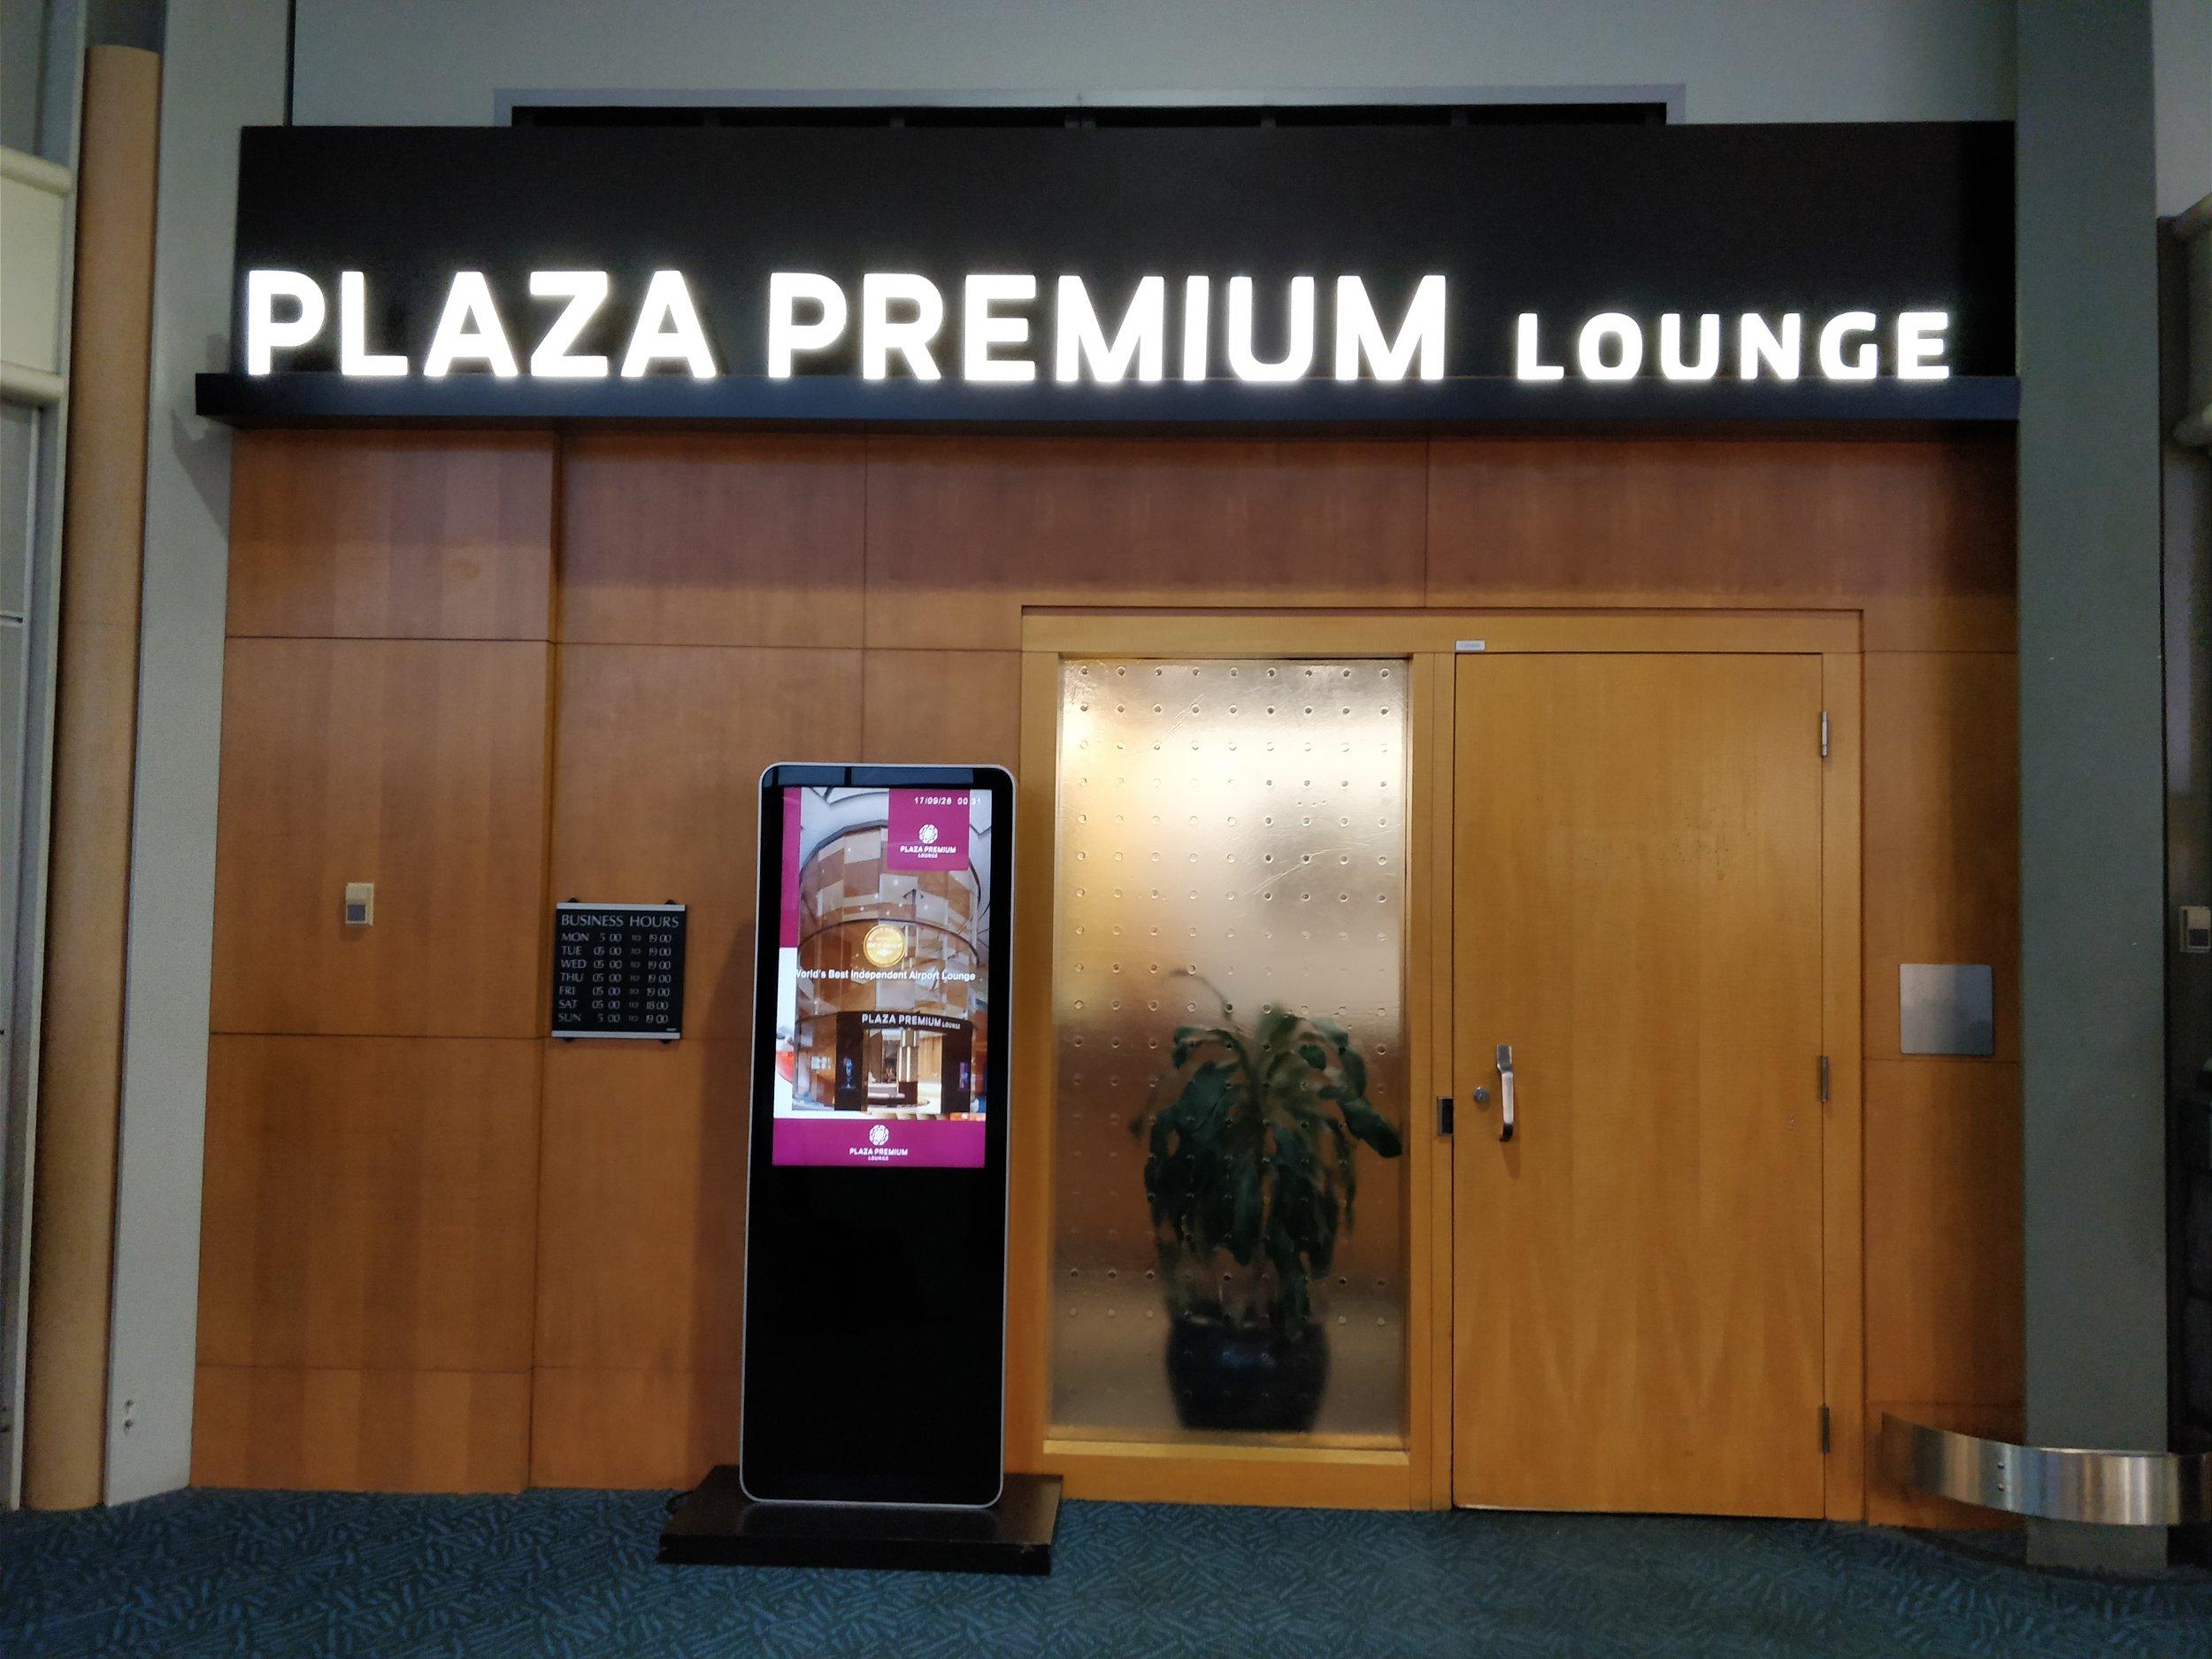 plaza premium lounge (usa departures)